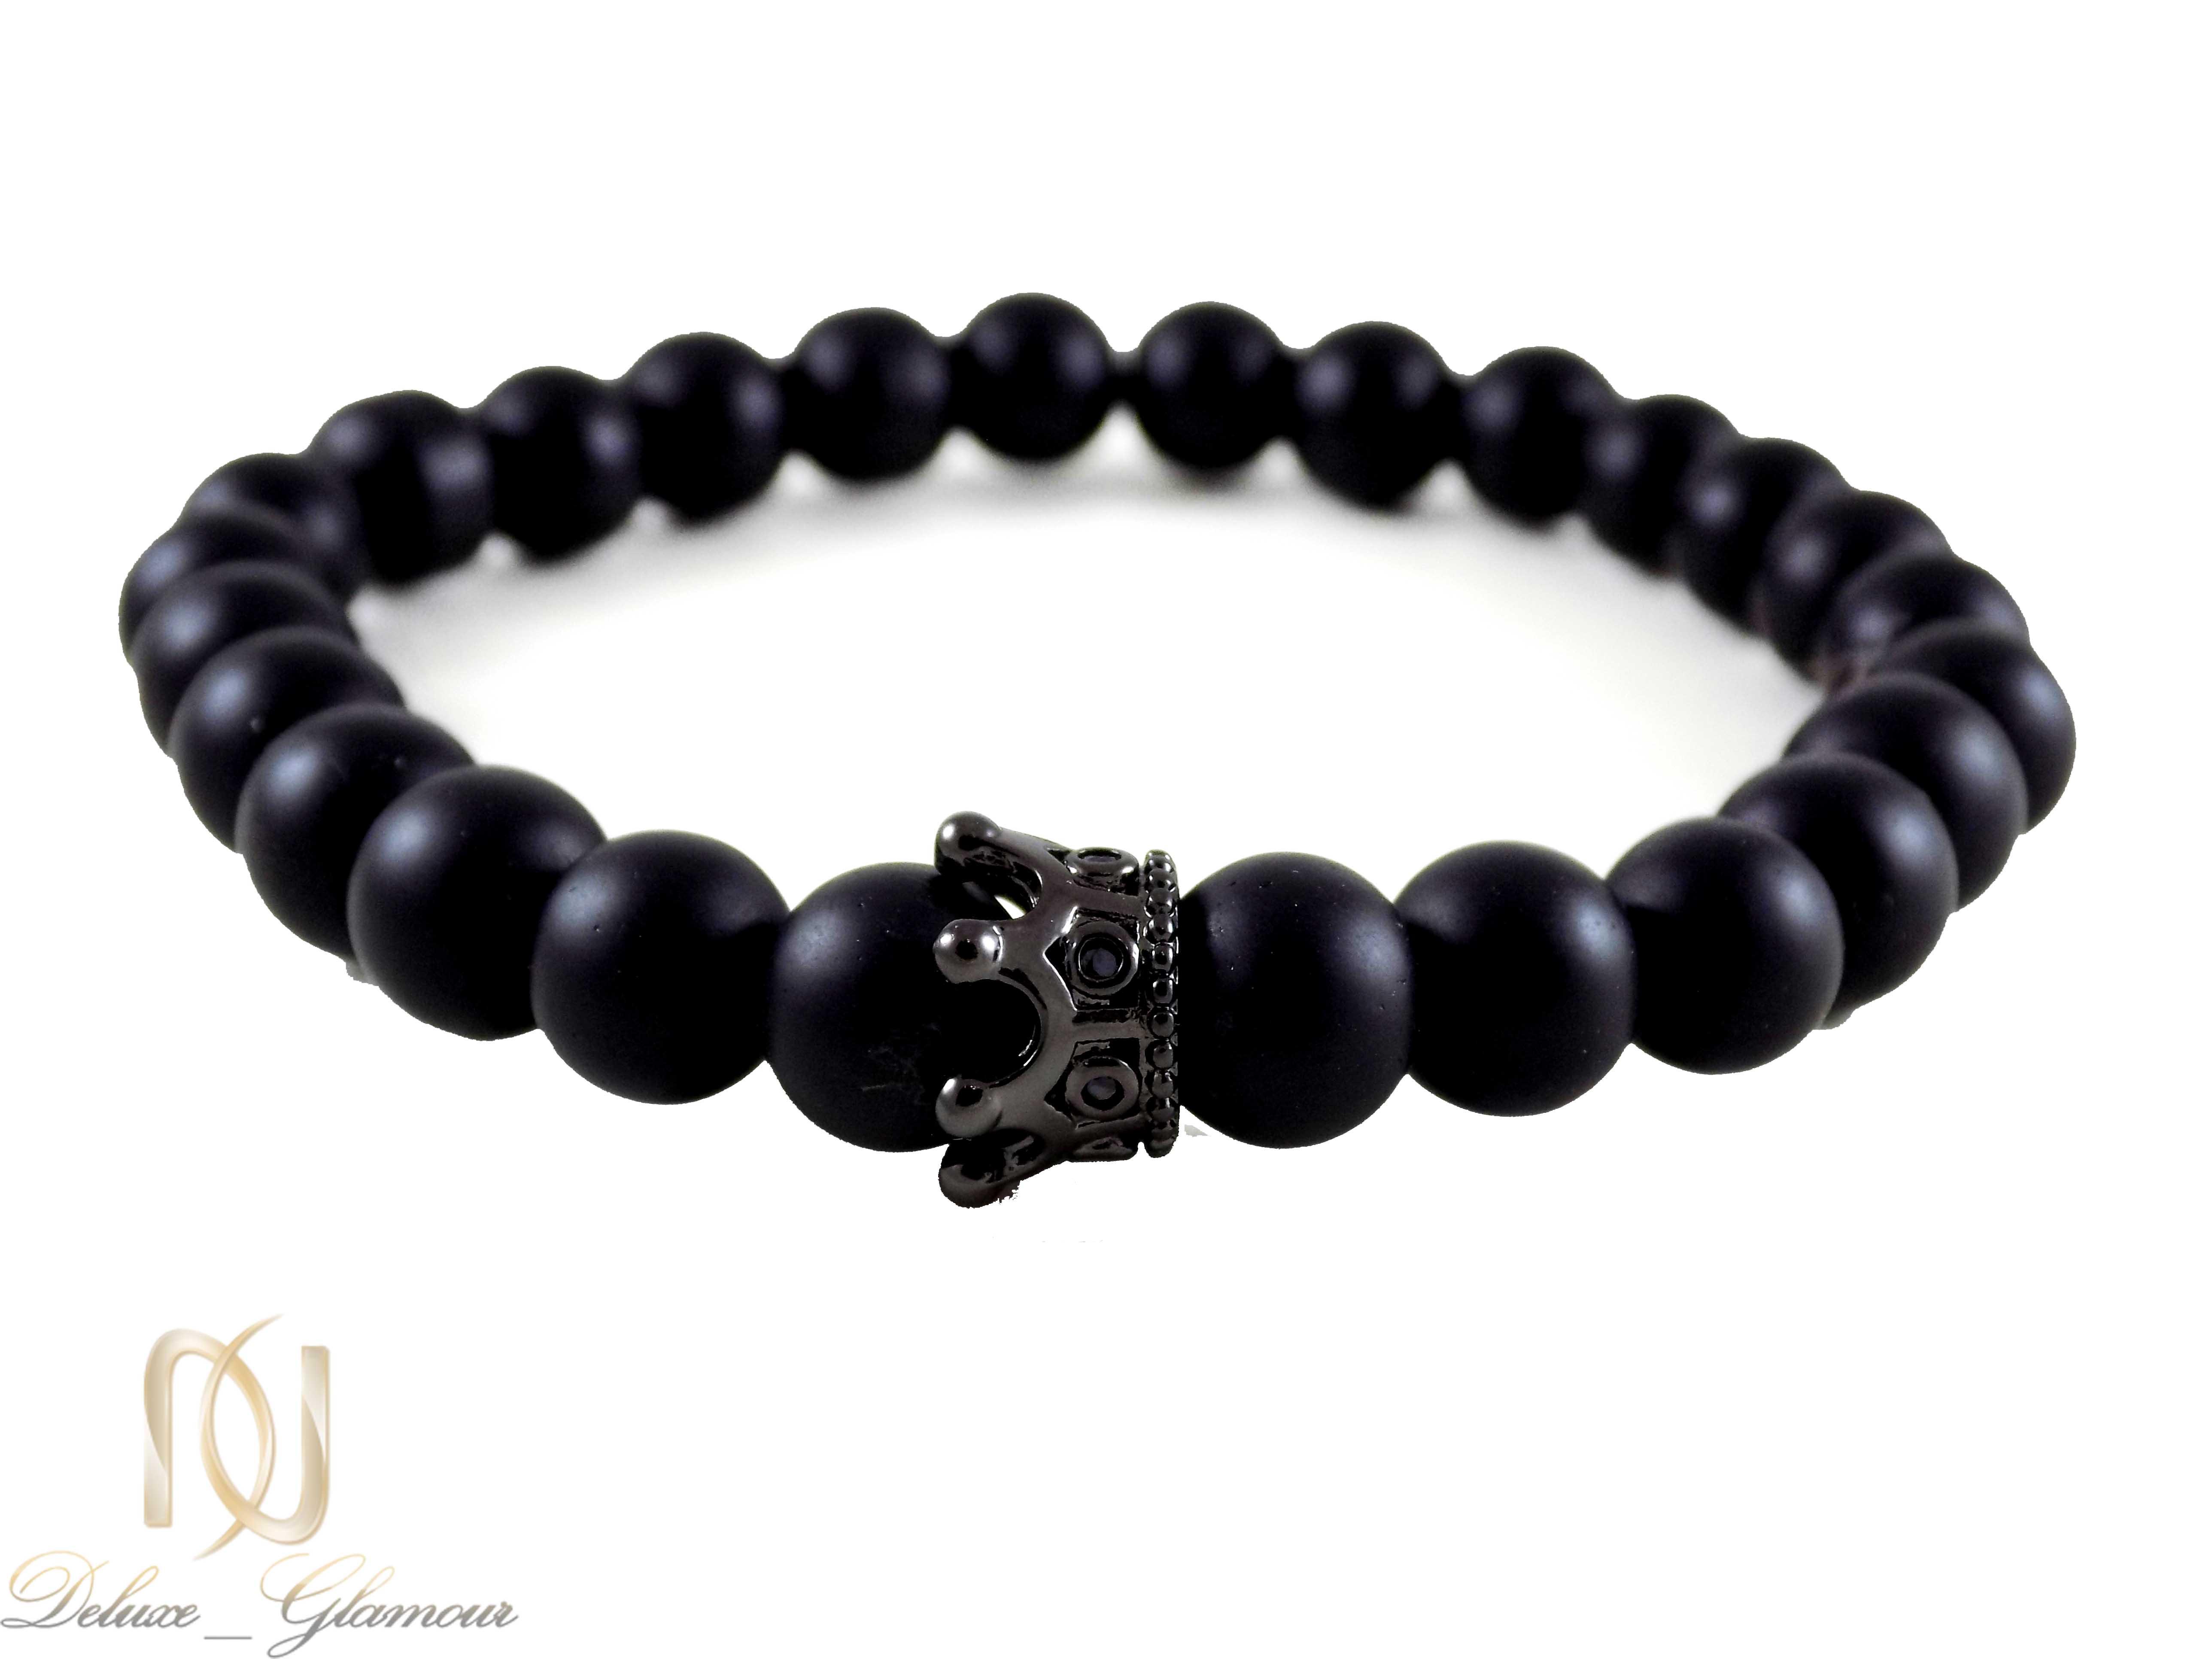 ست دستبند دخترانه و پسرانه طرح تاج Ds-n332 - تاج مشکی